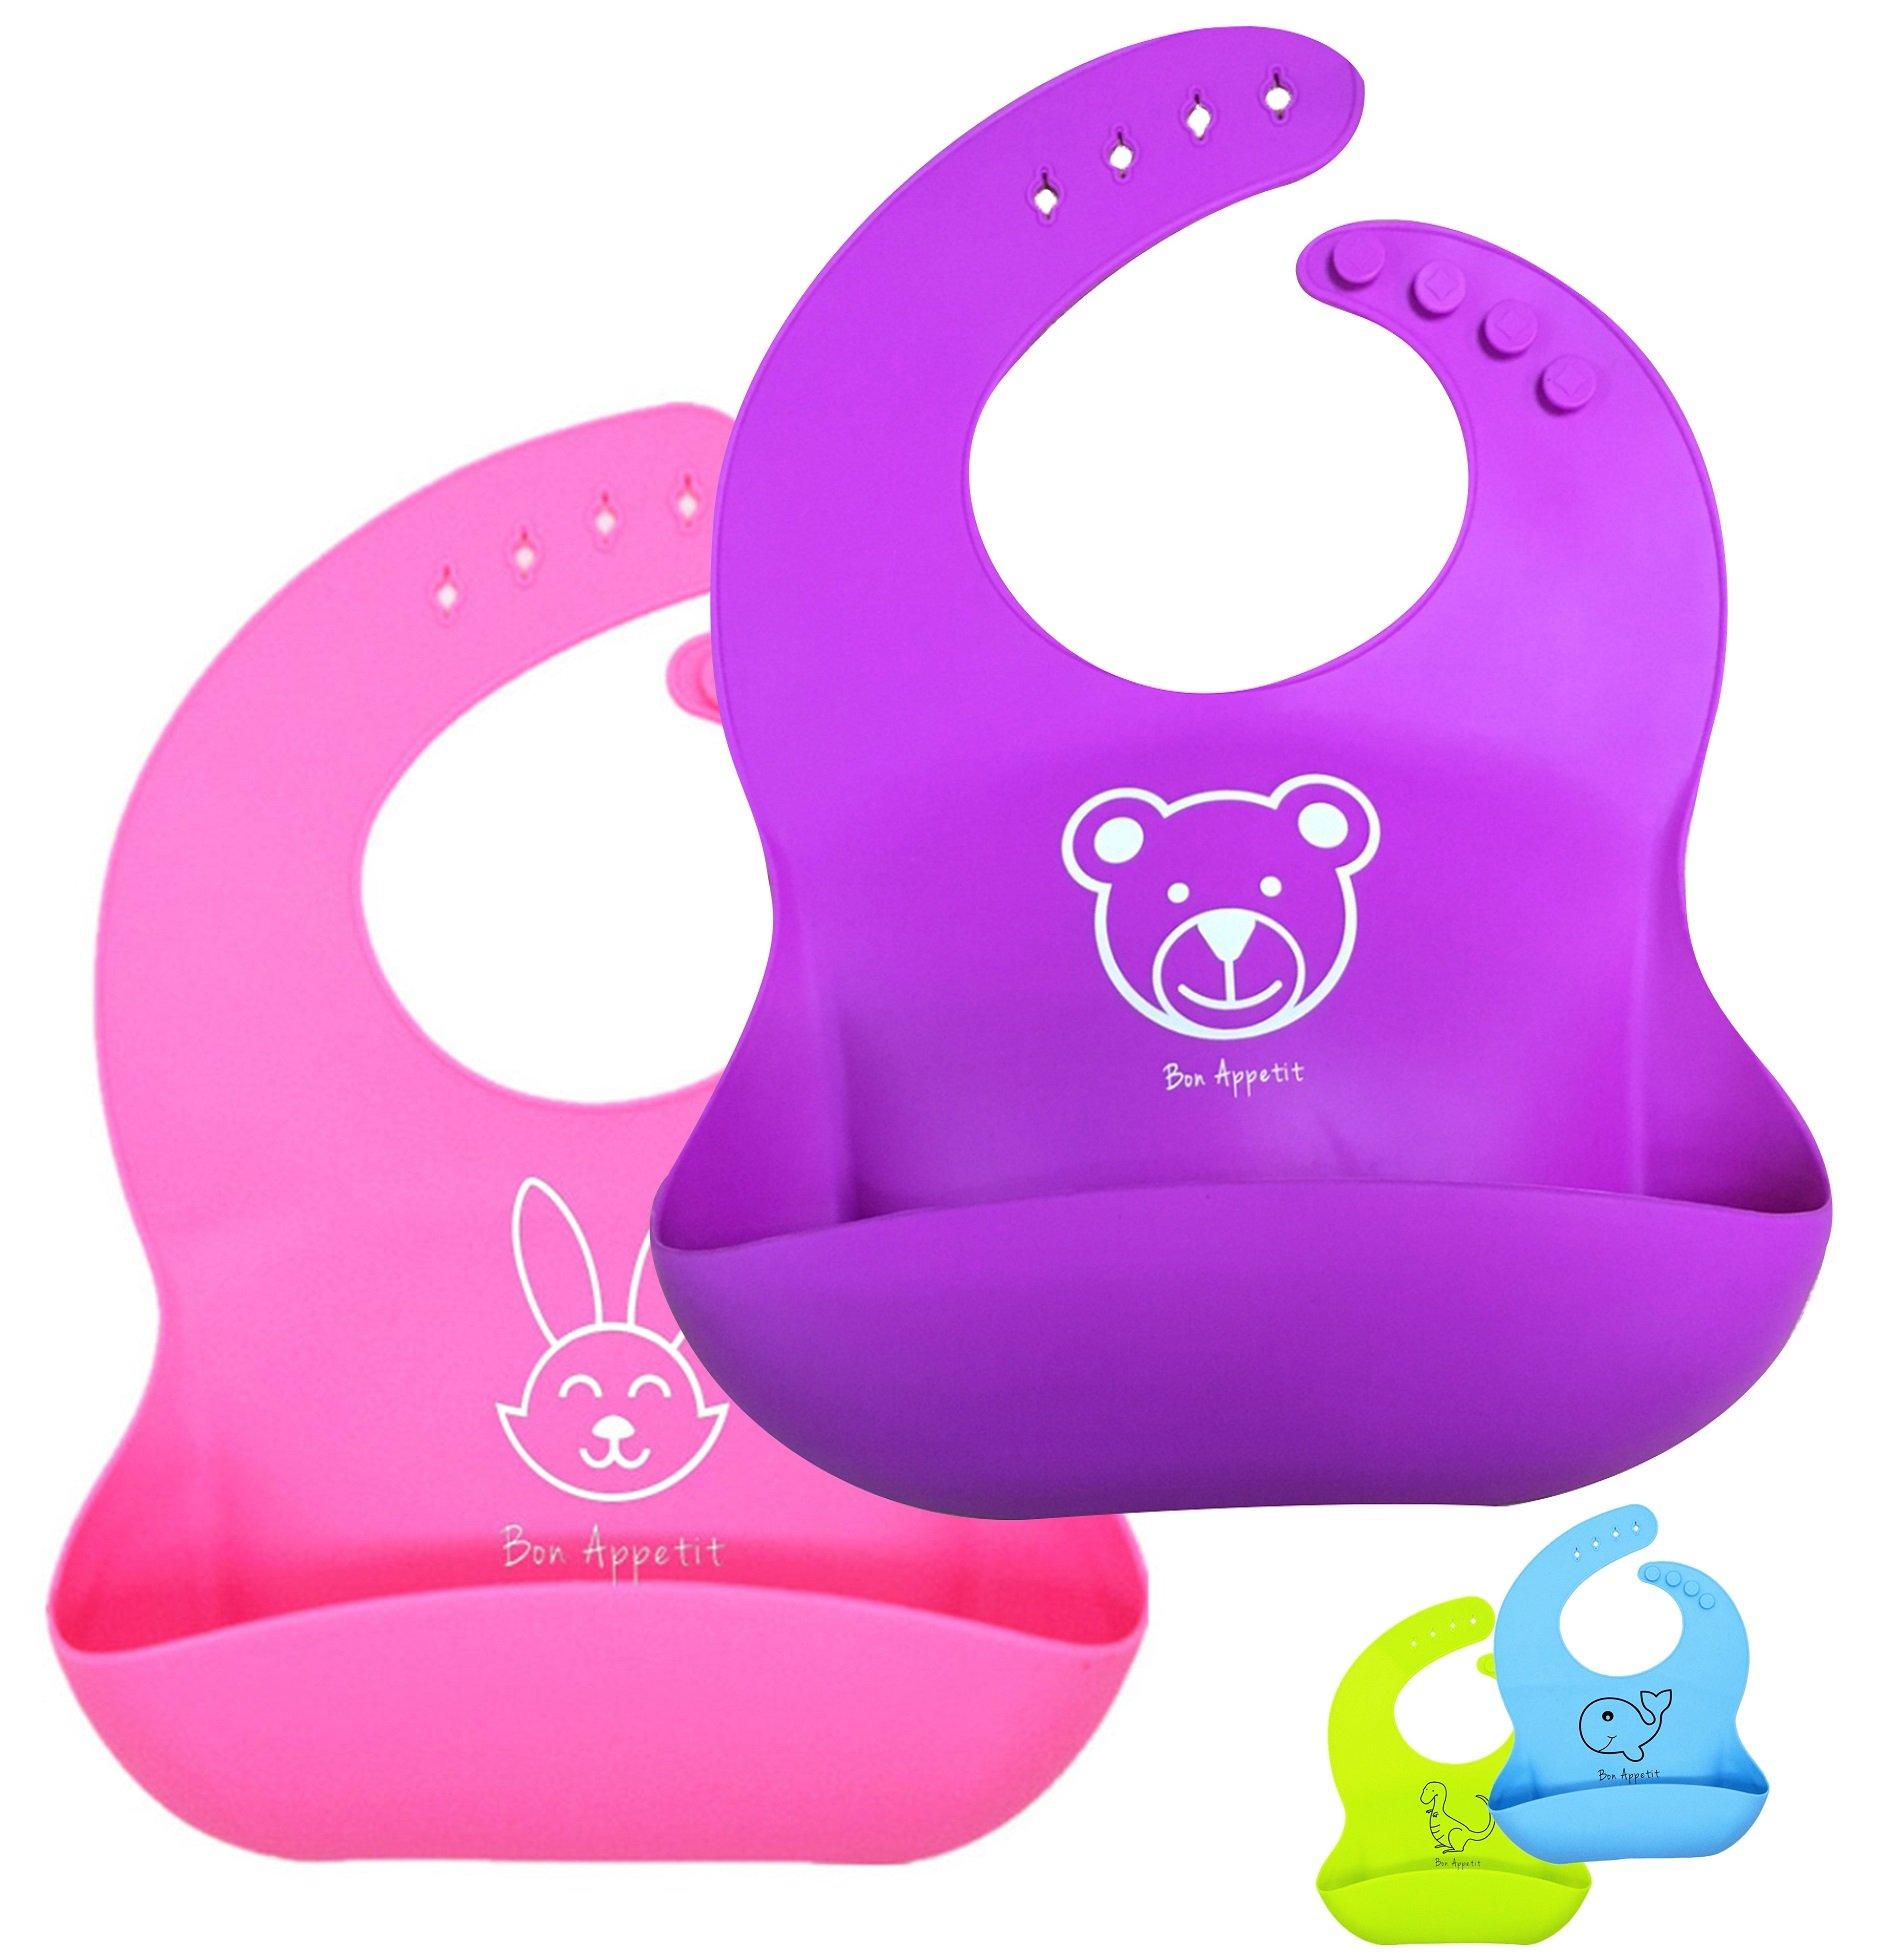 Soft Waterproof Silicone Baby Bib Easy Wipe - BPA Free - 100% Food Grade Silicone - Soft Comfortable Adjustable Collar - Foldable - 2 Pack Baby Bibs (Pink Purple) Friendly Animal Print Baby Bibs